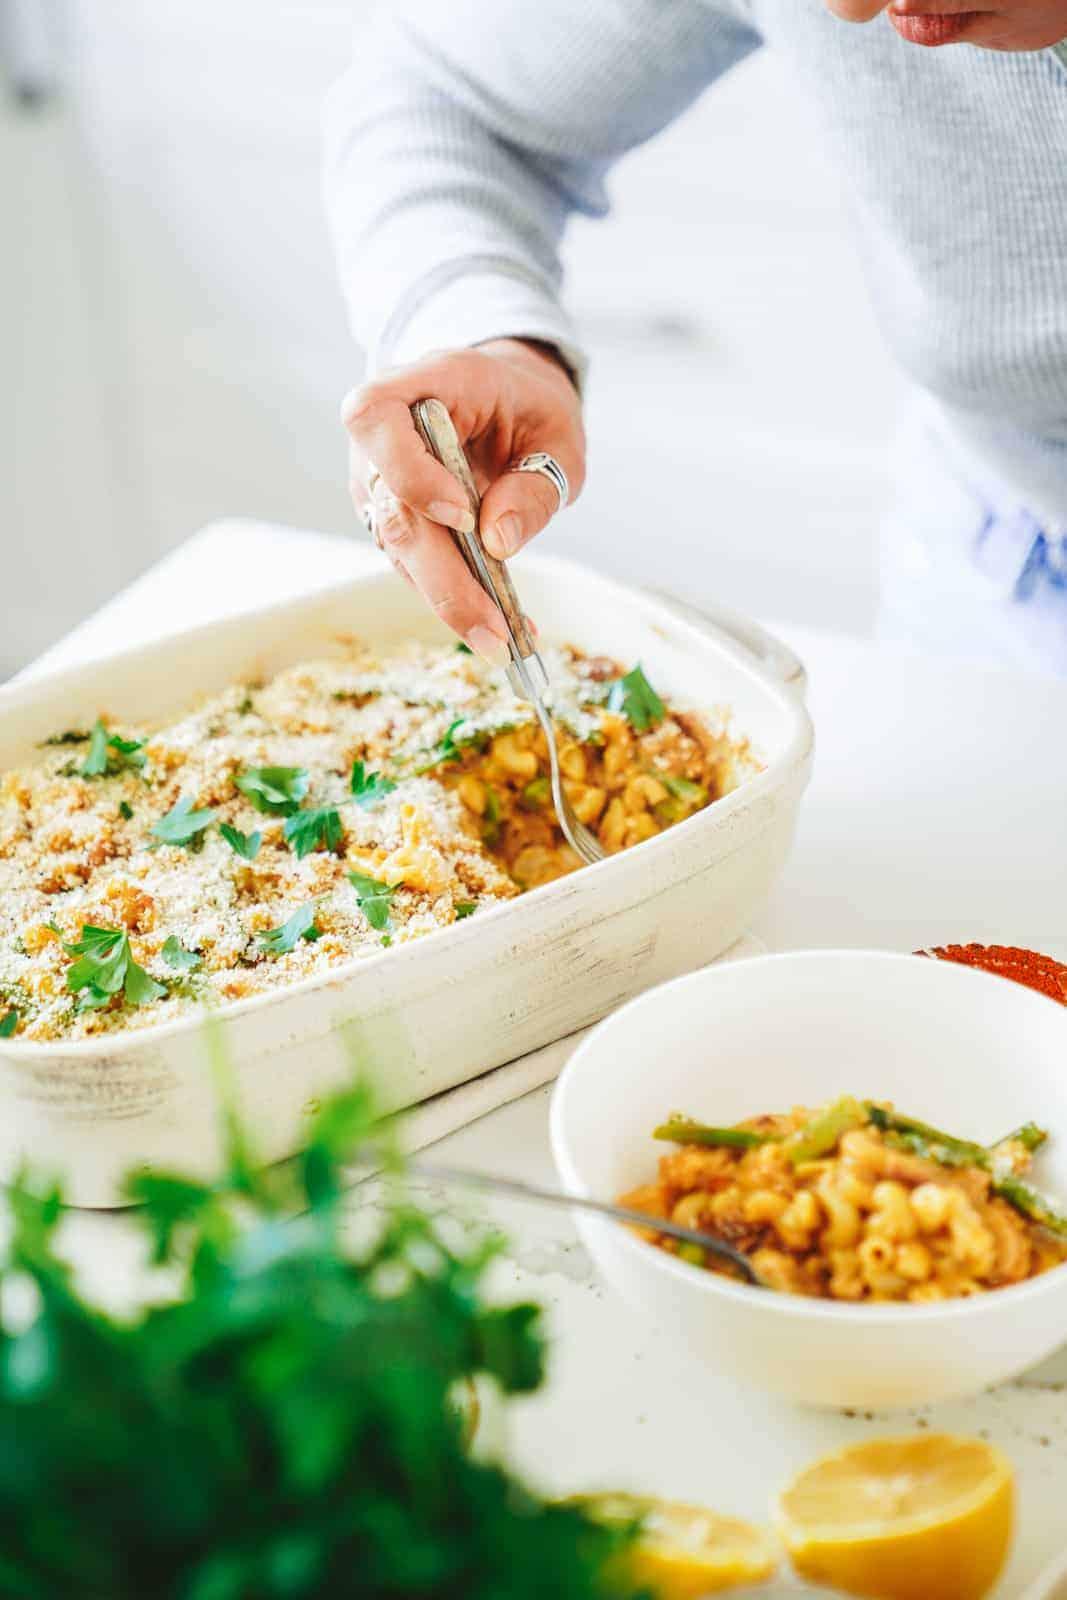 Creamy vegan tuna casserole